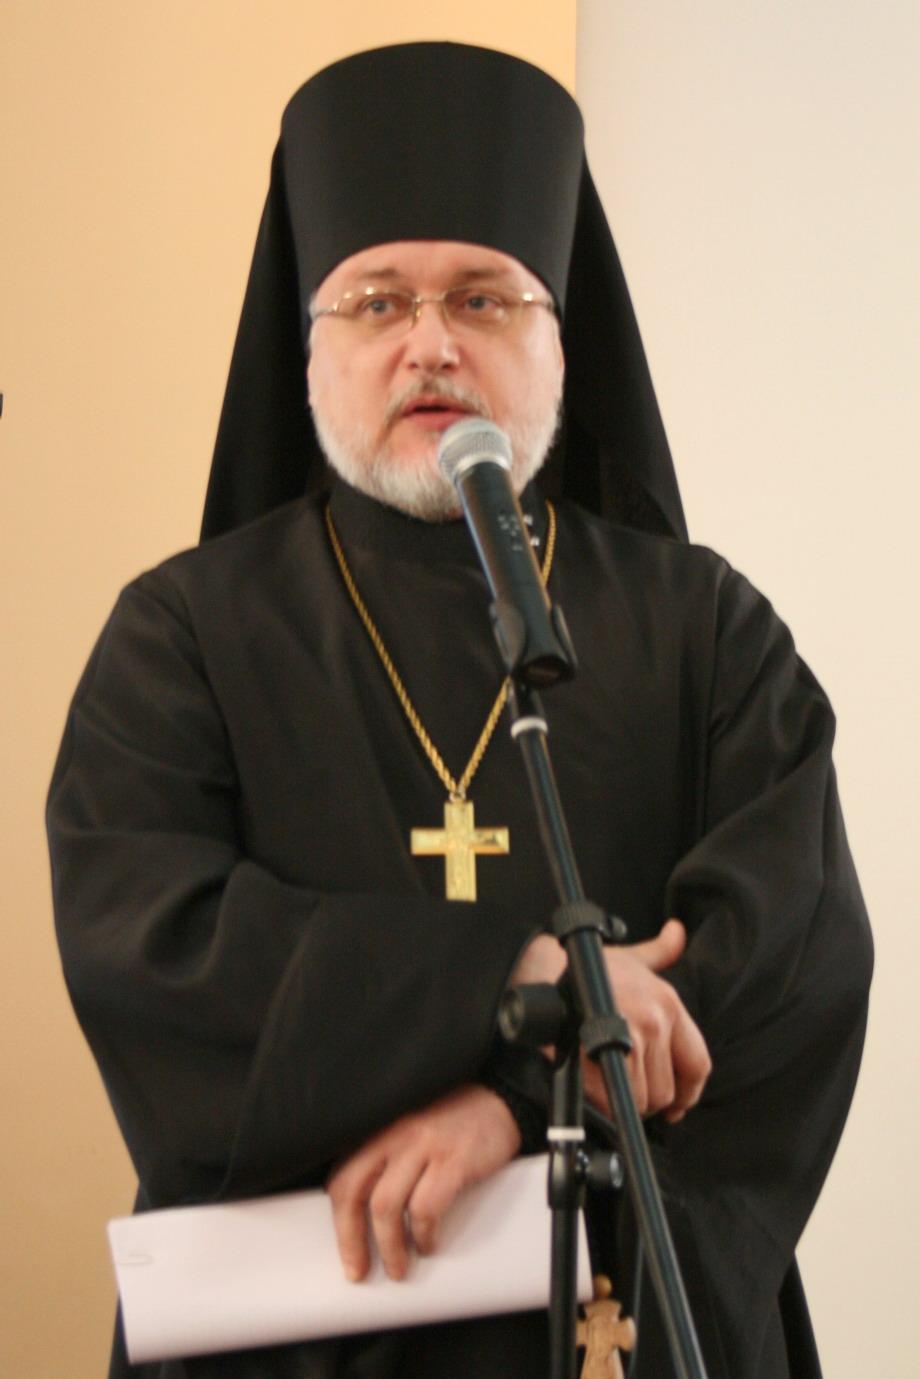 игумен Филипп Симонов